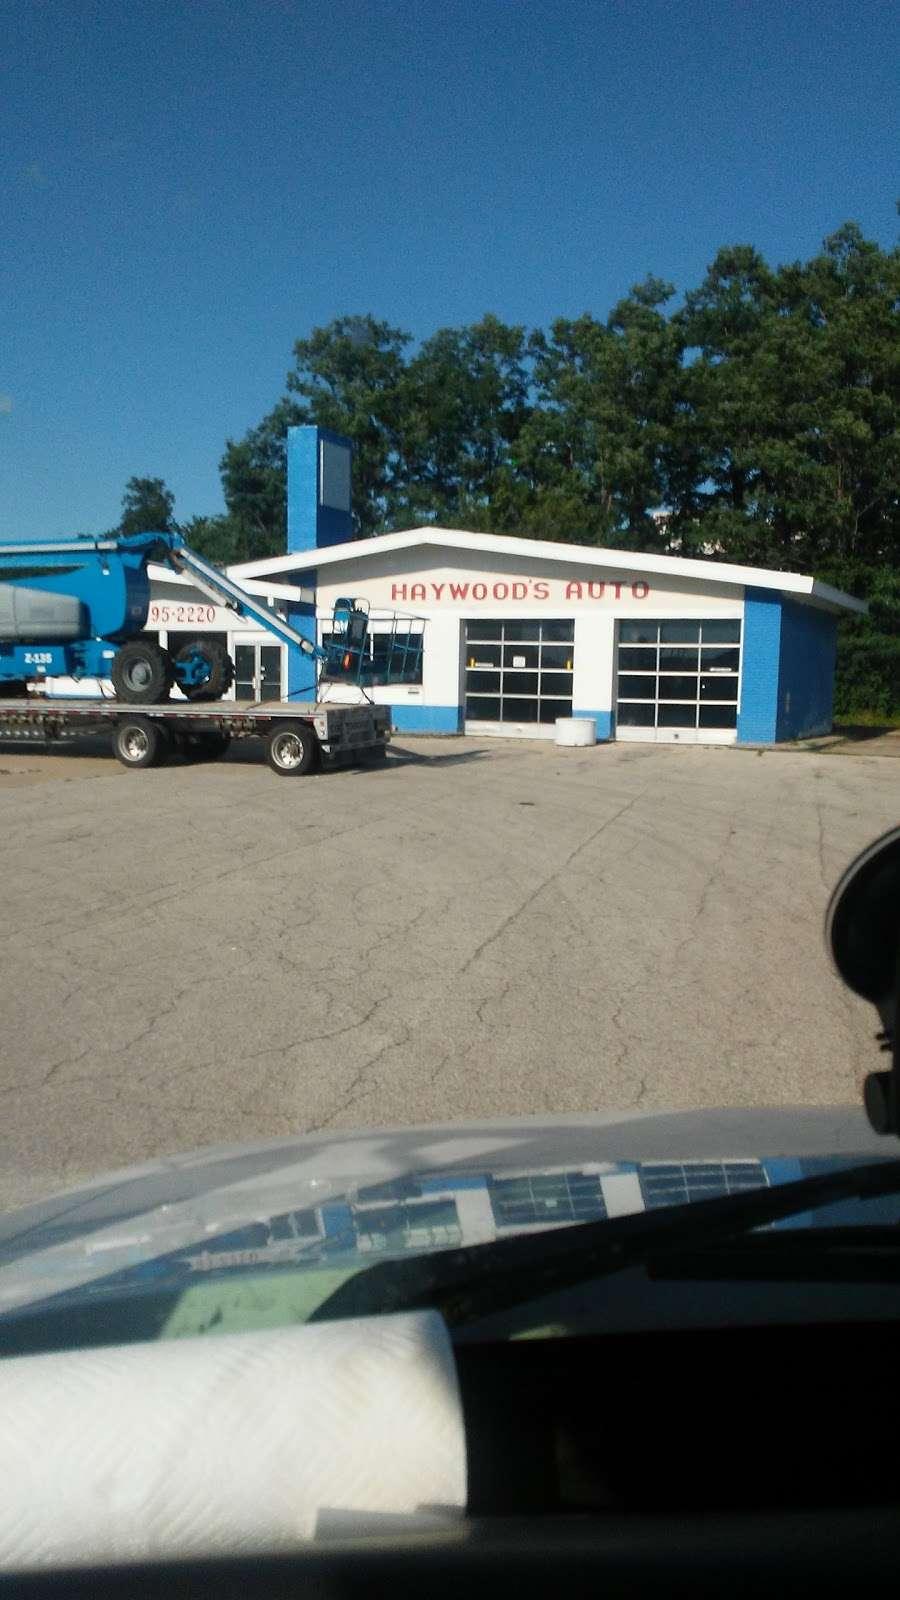 Redners Warehouse Markets - storage  | Photo 2 of 4 | Address: 4201 Pottsville Pike #9, Reading, PA 19605, USA | Phone: (610) 929-8683